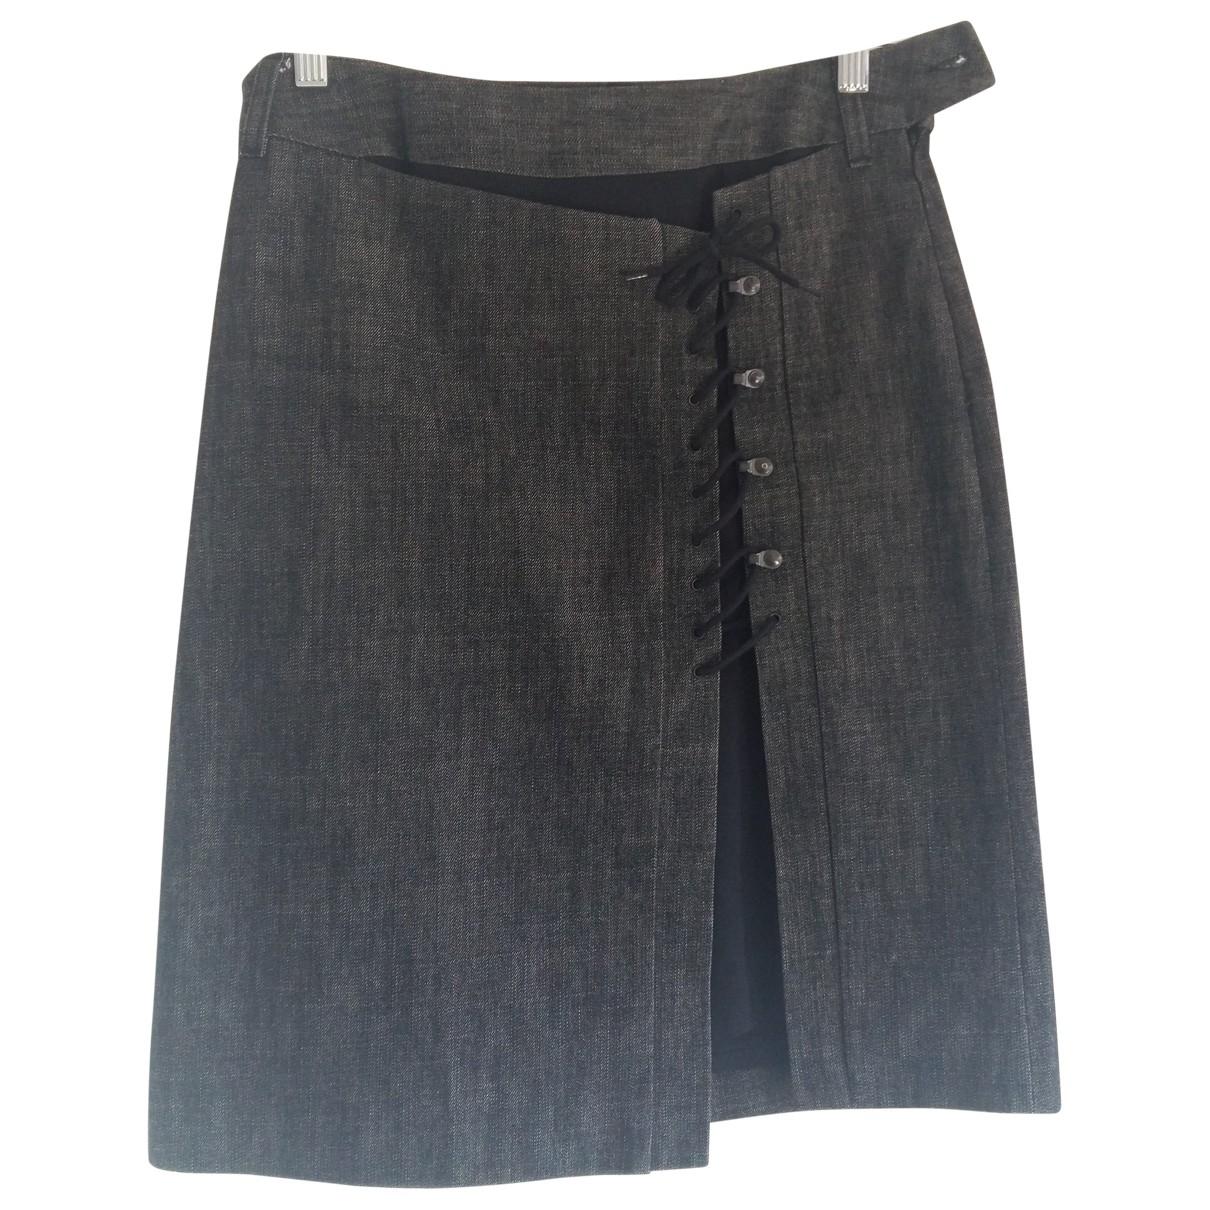 Bill Tornade \N Black Cotton skirt for Women 36 FR